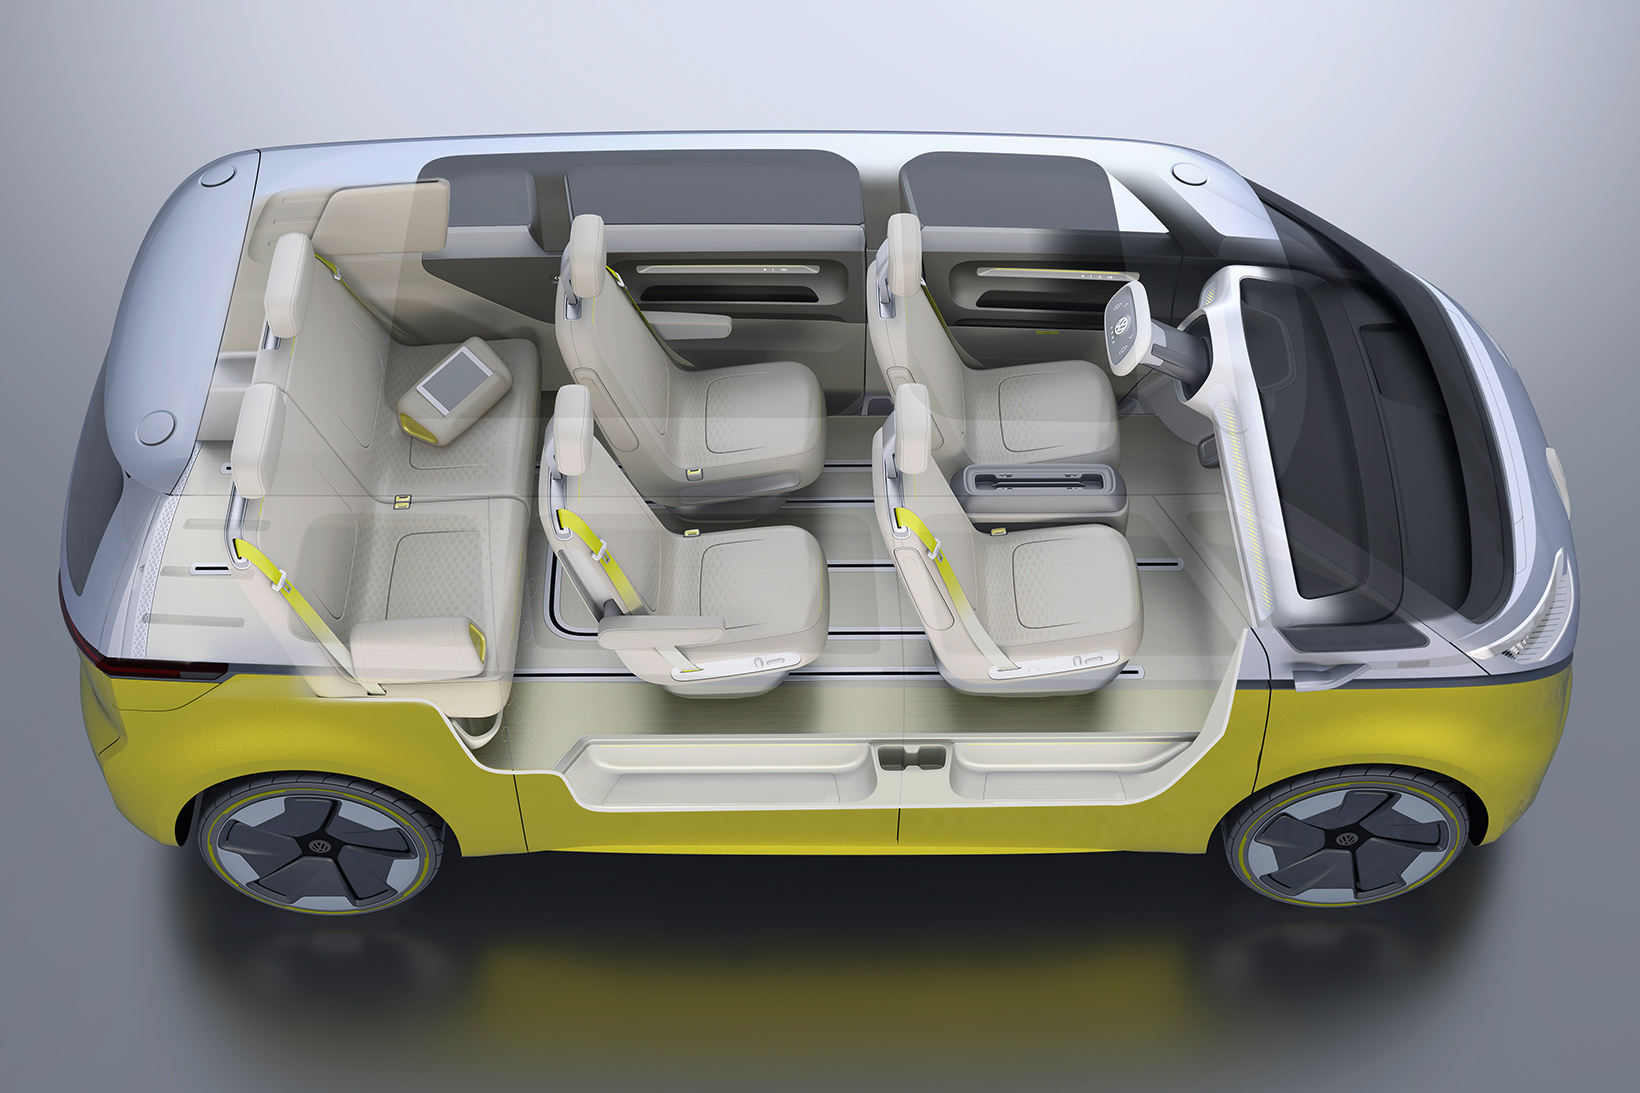 volkswagen-id-buzz-concept-car-4